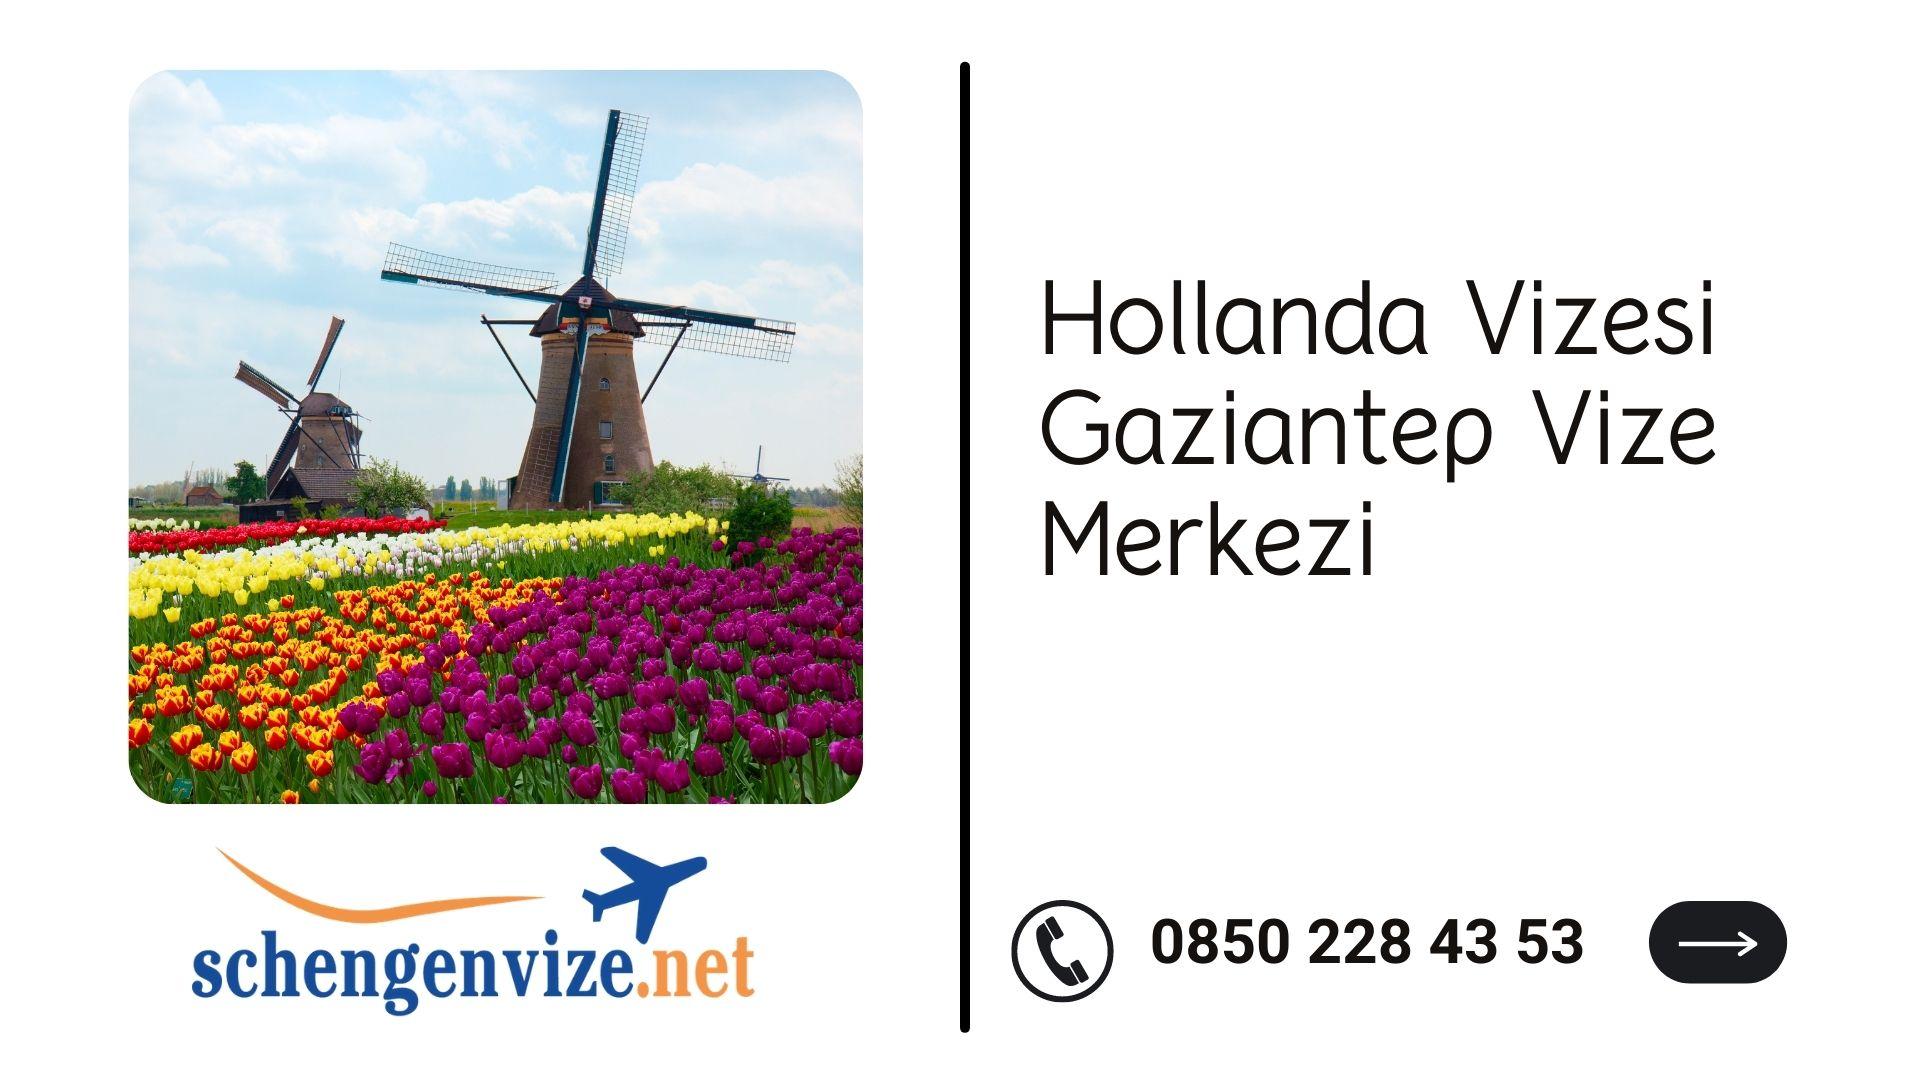 Hollanda Vizesi Gaziantep Vize Merkezi